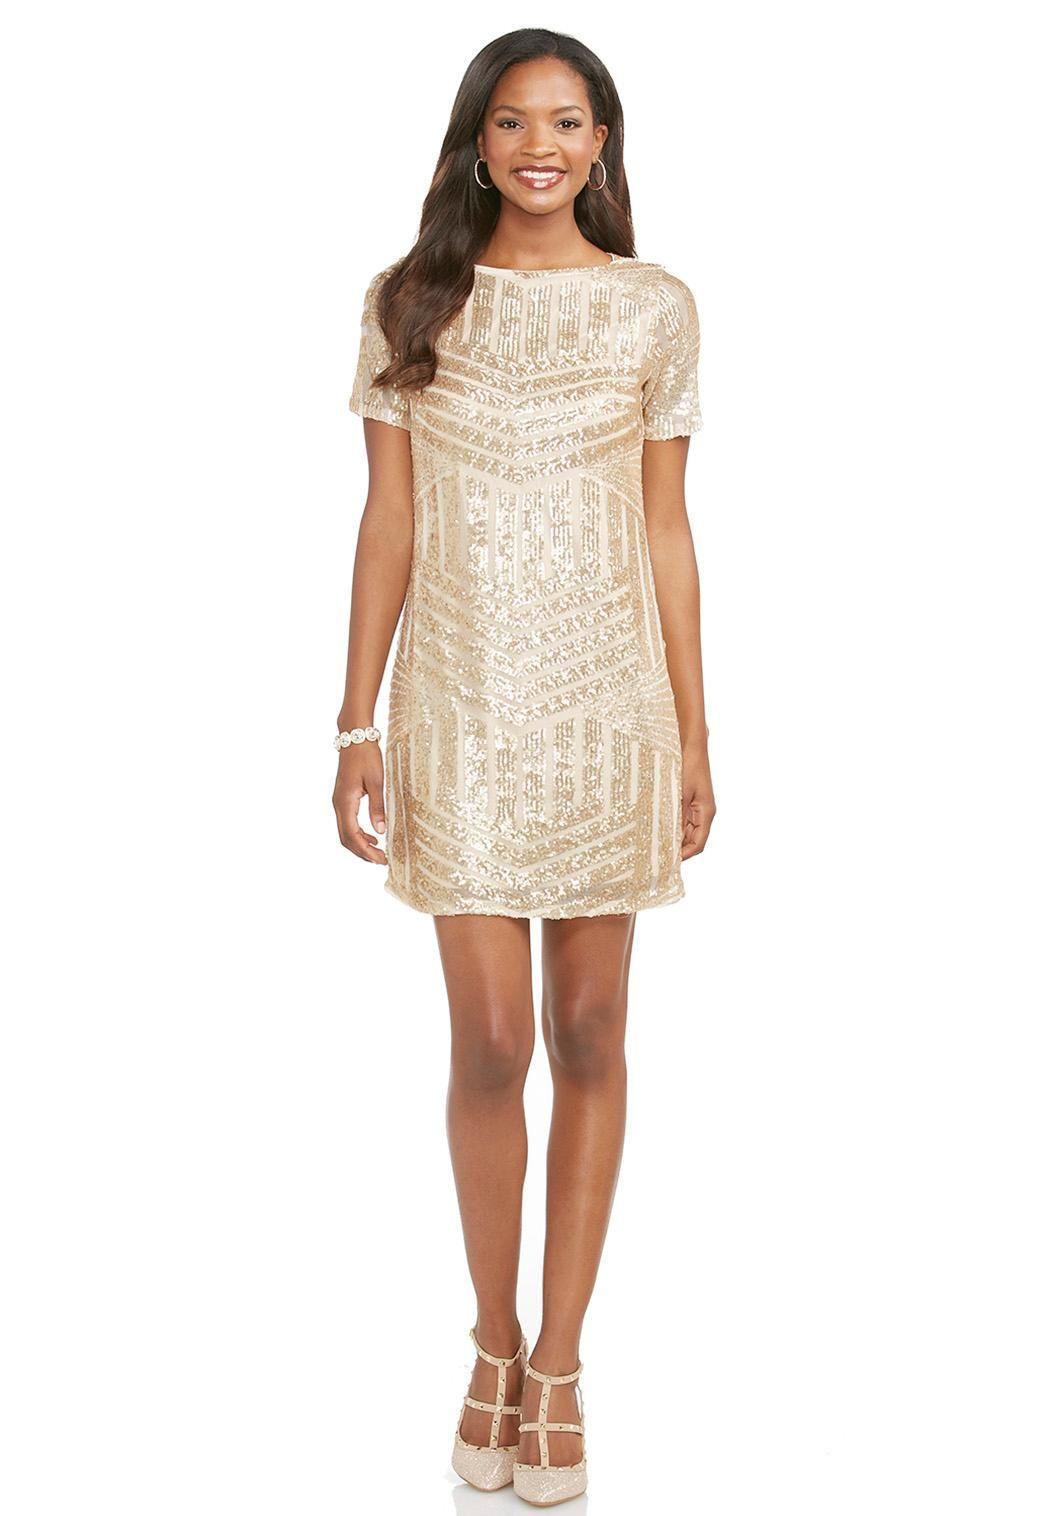 Gold Sequin Shift Dress Dresses Cato Fashions Dresses Cato Fashion Fashion [ 1516 x 1050 Pixel ]